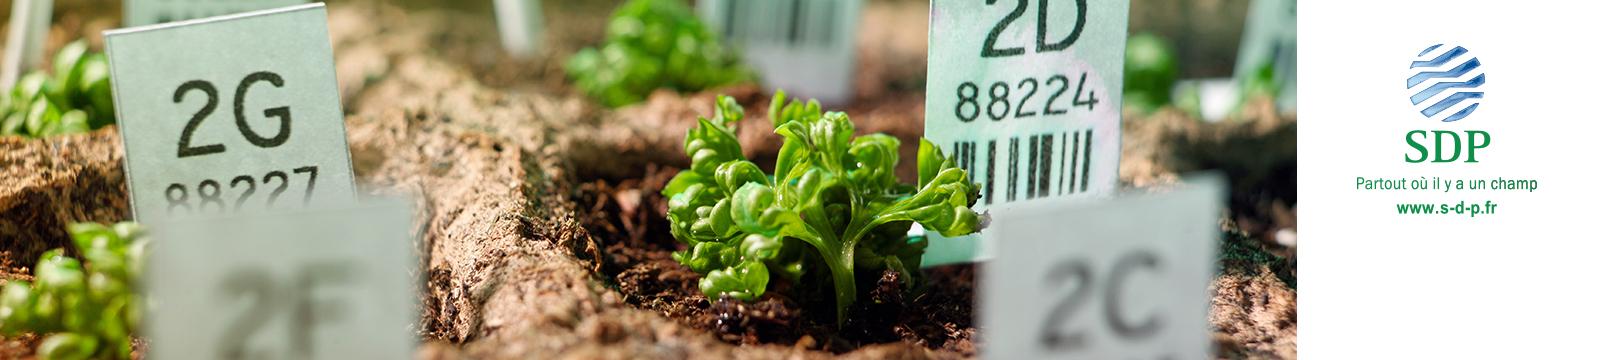 Трэйдкорп /  Sapec Agro Business приобретёт французскую компанию SDP